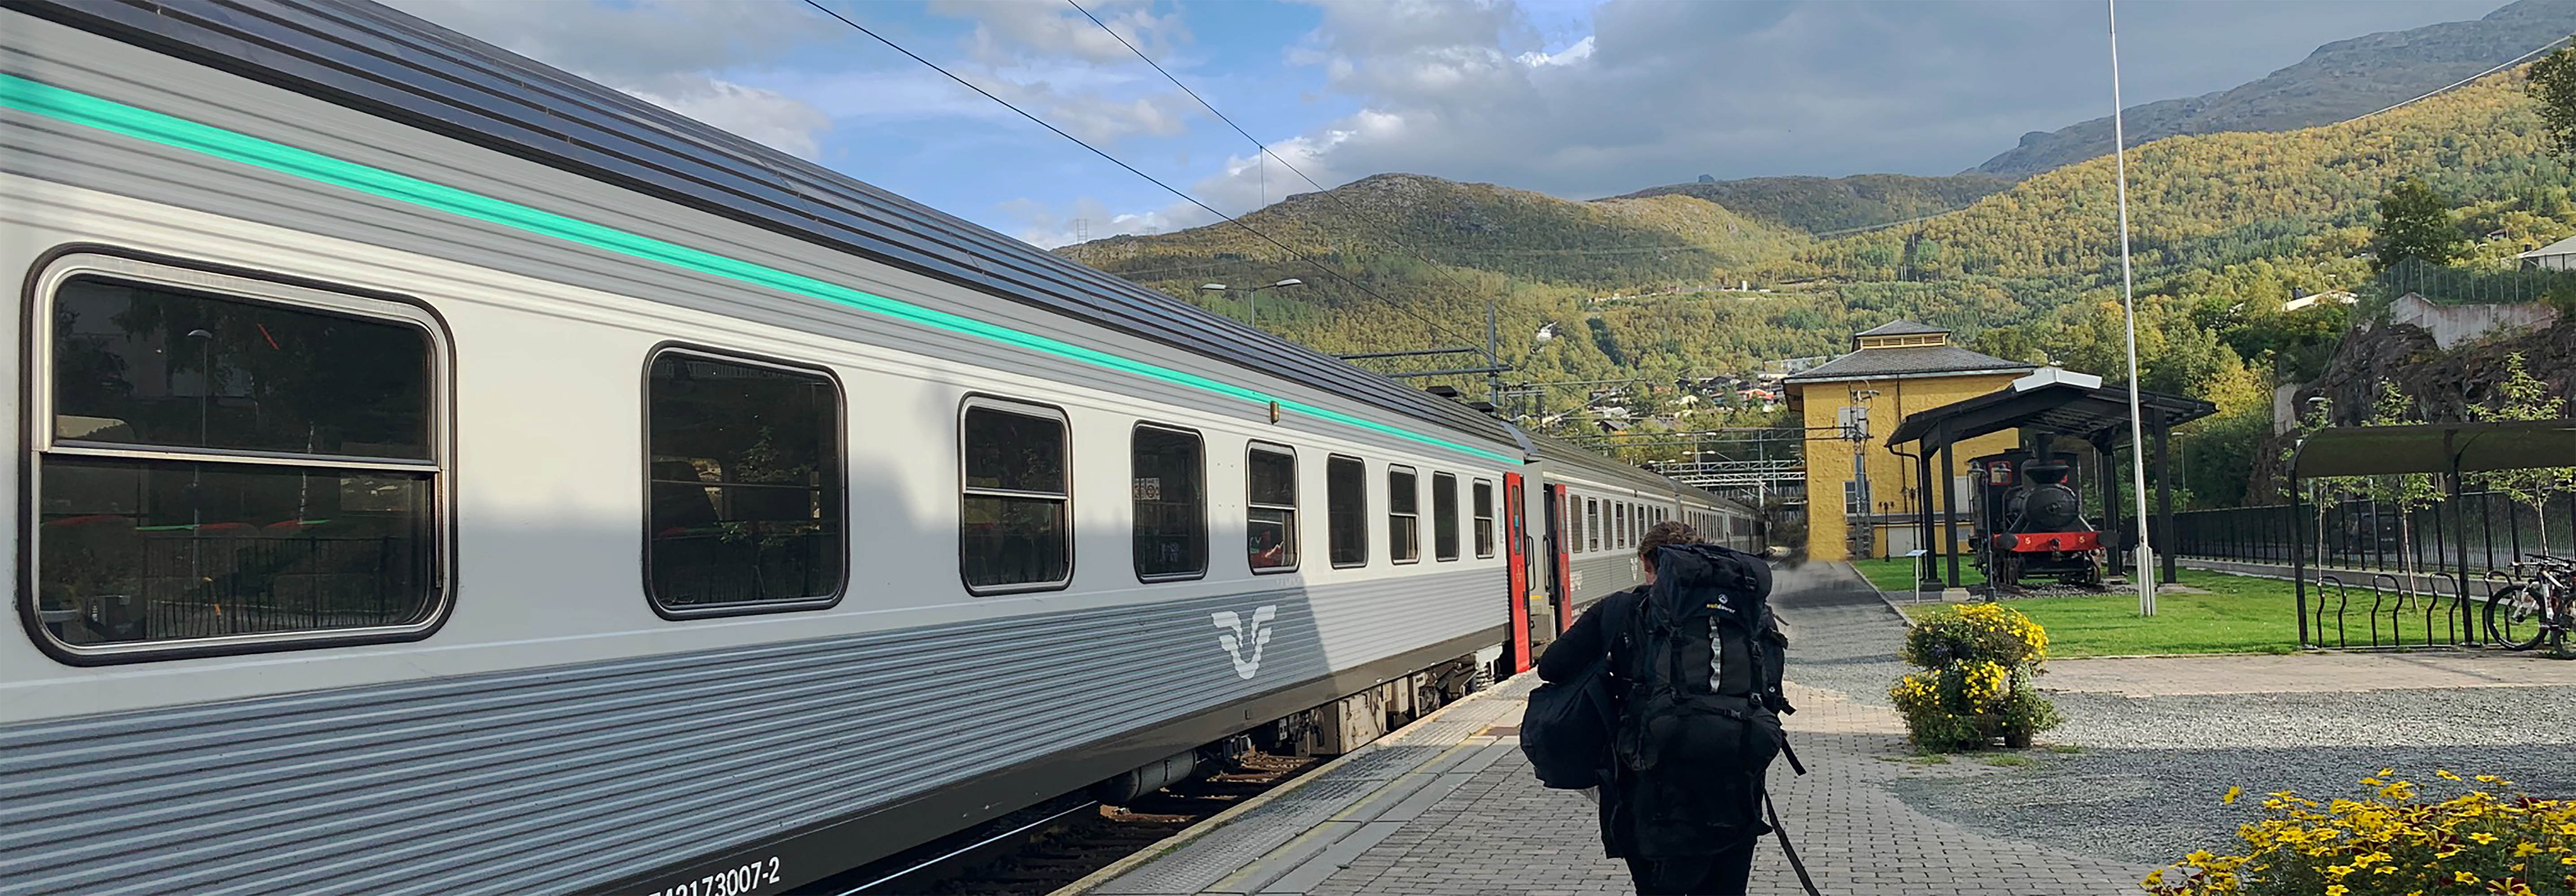 Interrail Rucksack, outdoorer Trekkingrucksack